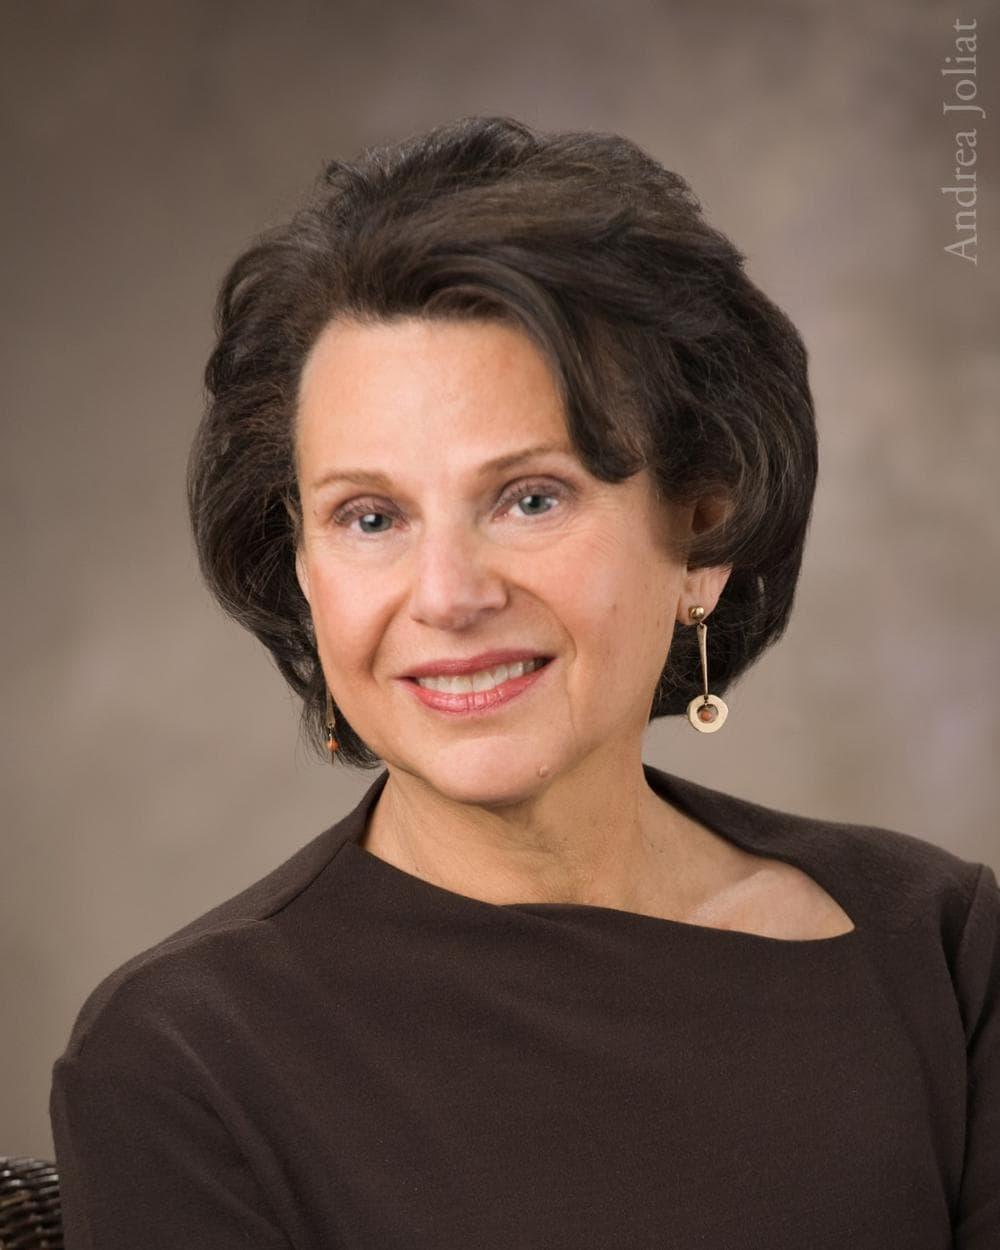 Dr. Aline Zoldbrod